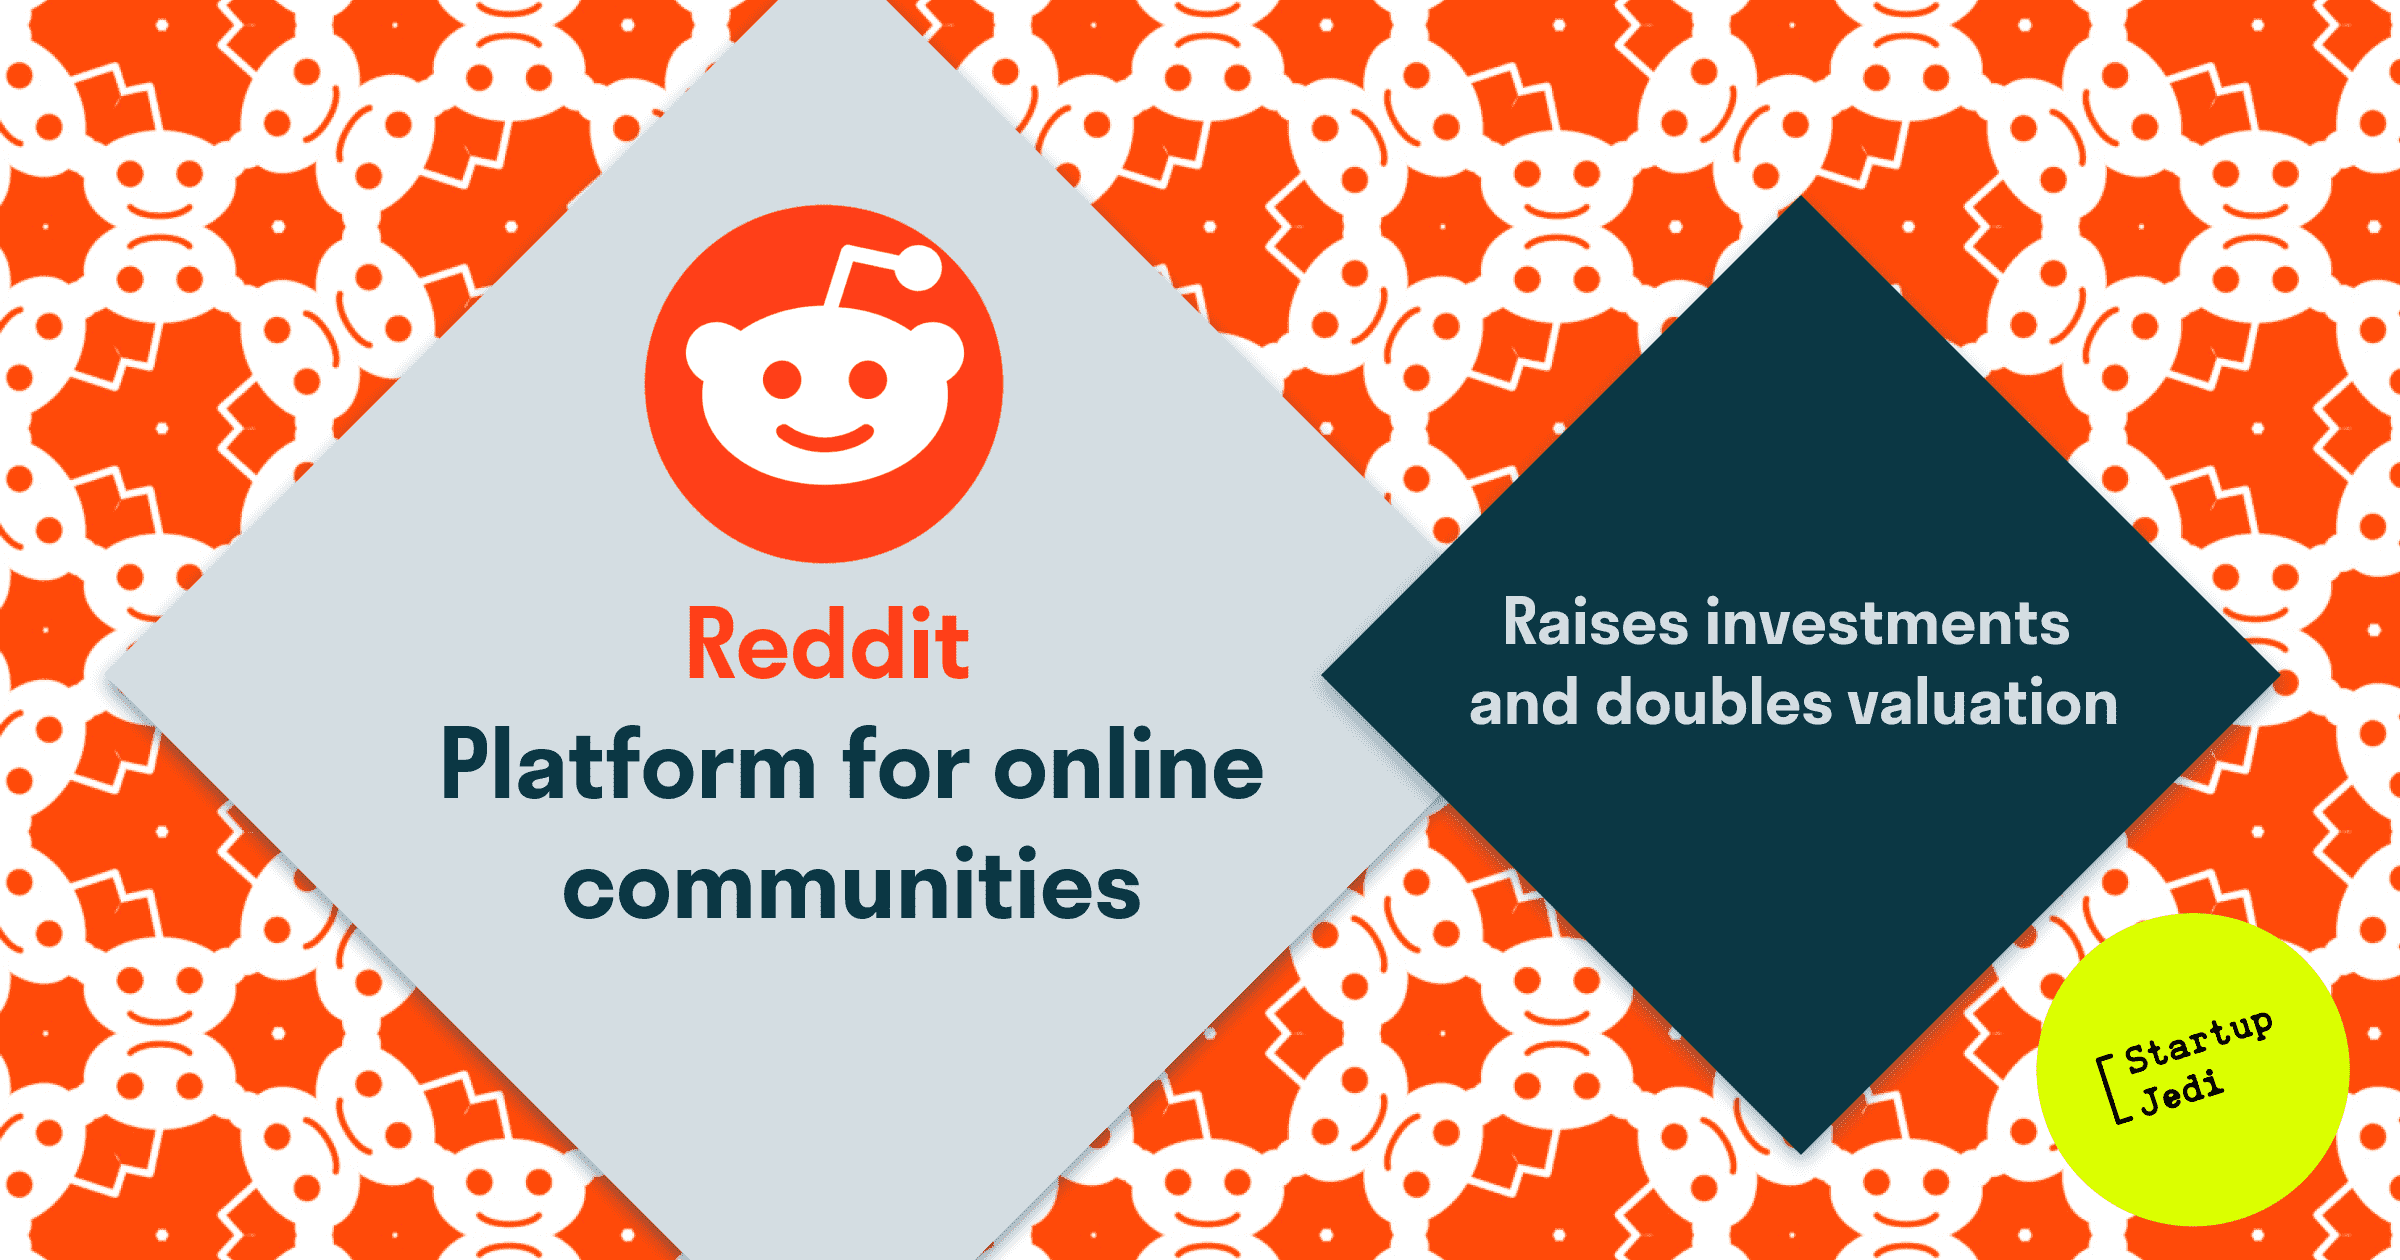 Reddit raises its valuation